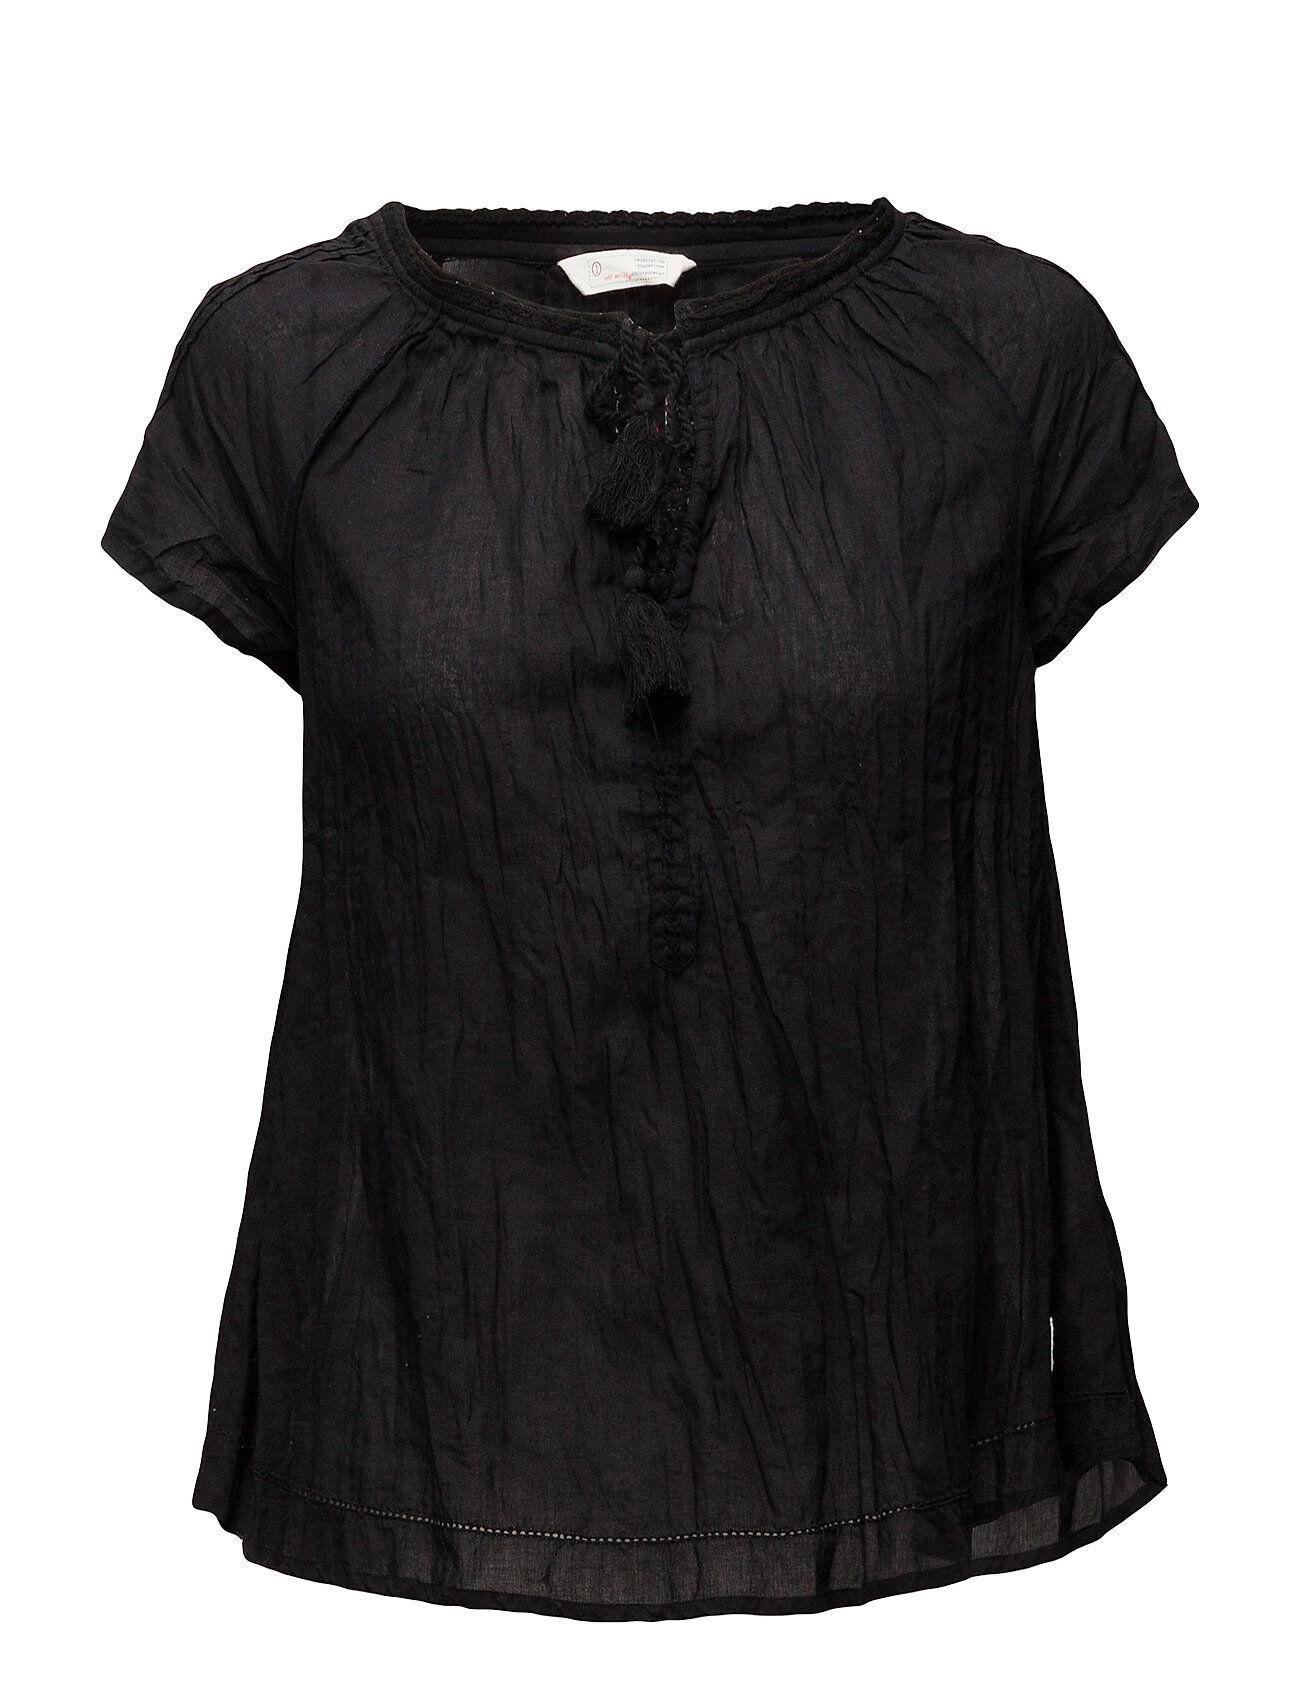 Image of ODD MOLLY So Long S/S Blouse Blouses Short-sleeved Musta ODD MOLLY